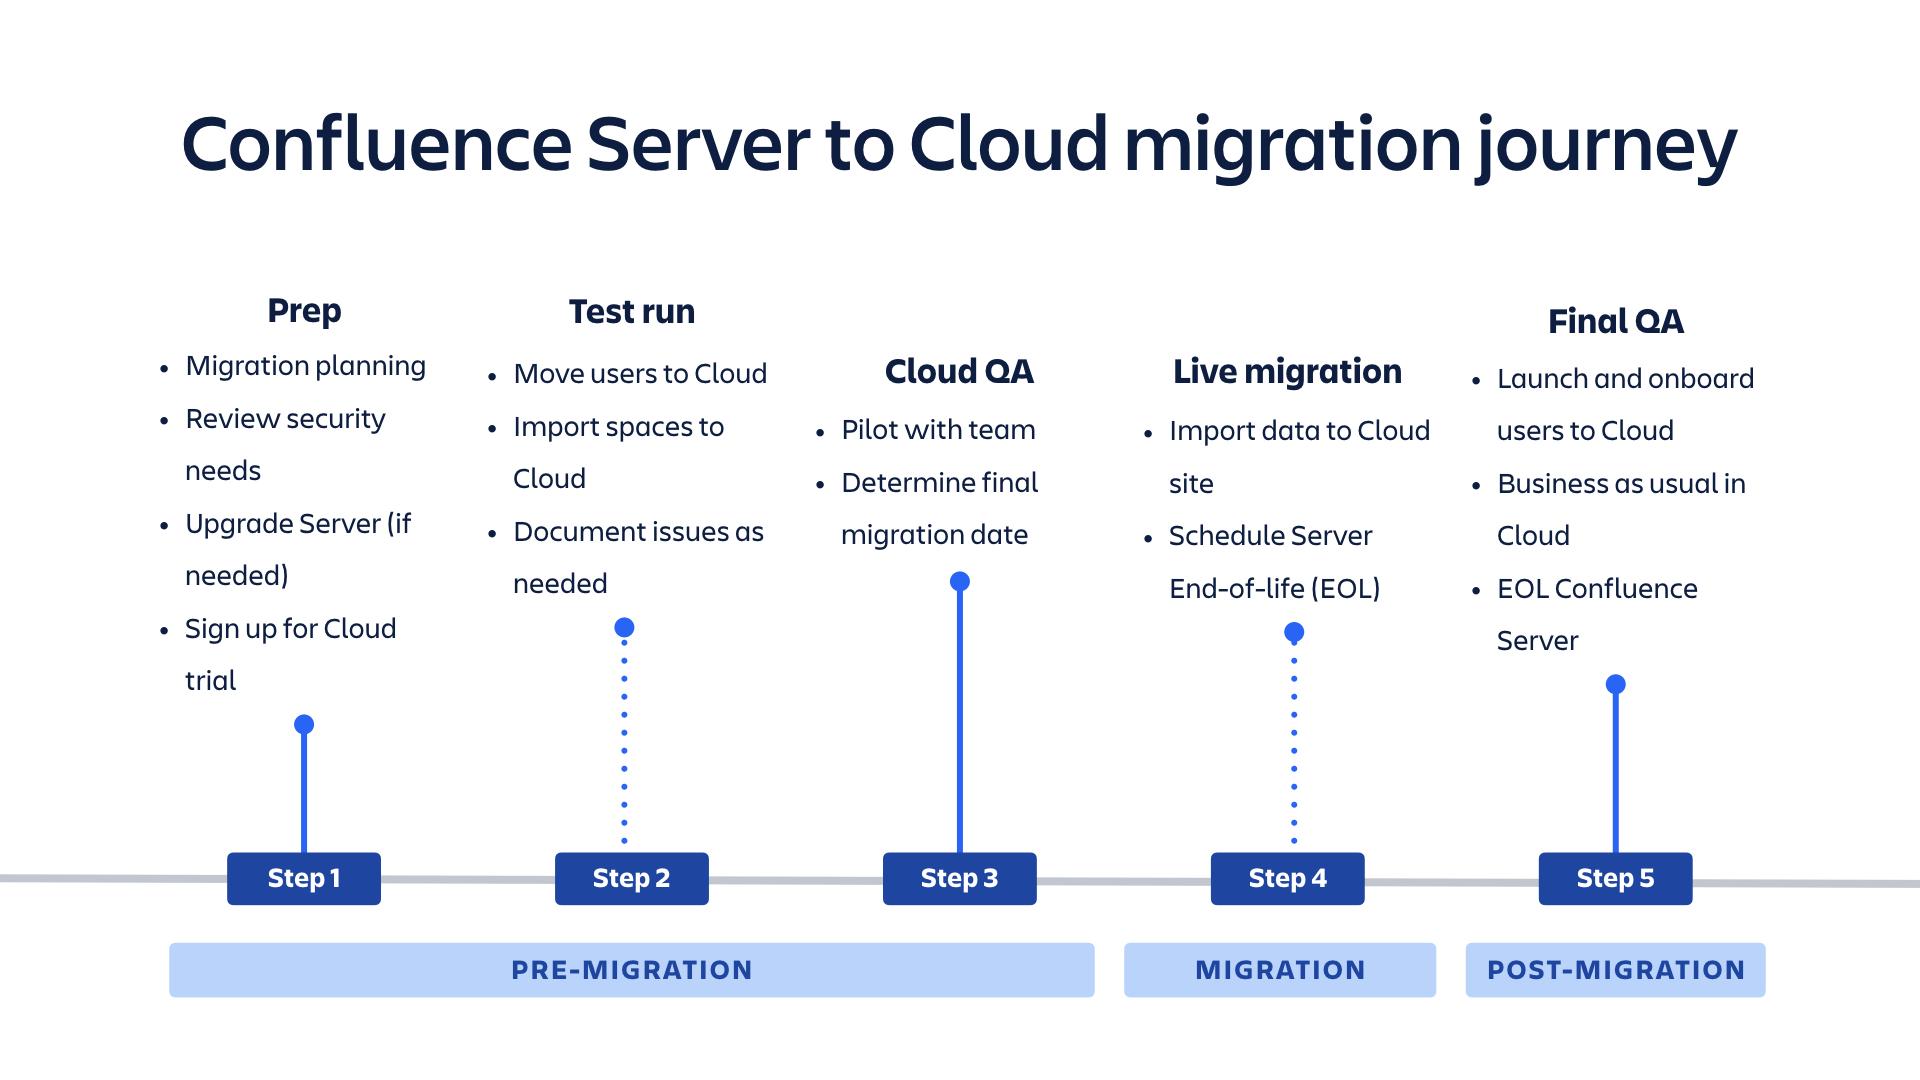 Confluence Server to Cloud migration journey diagram